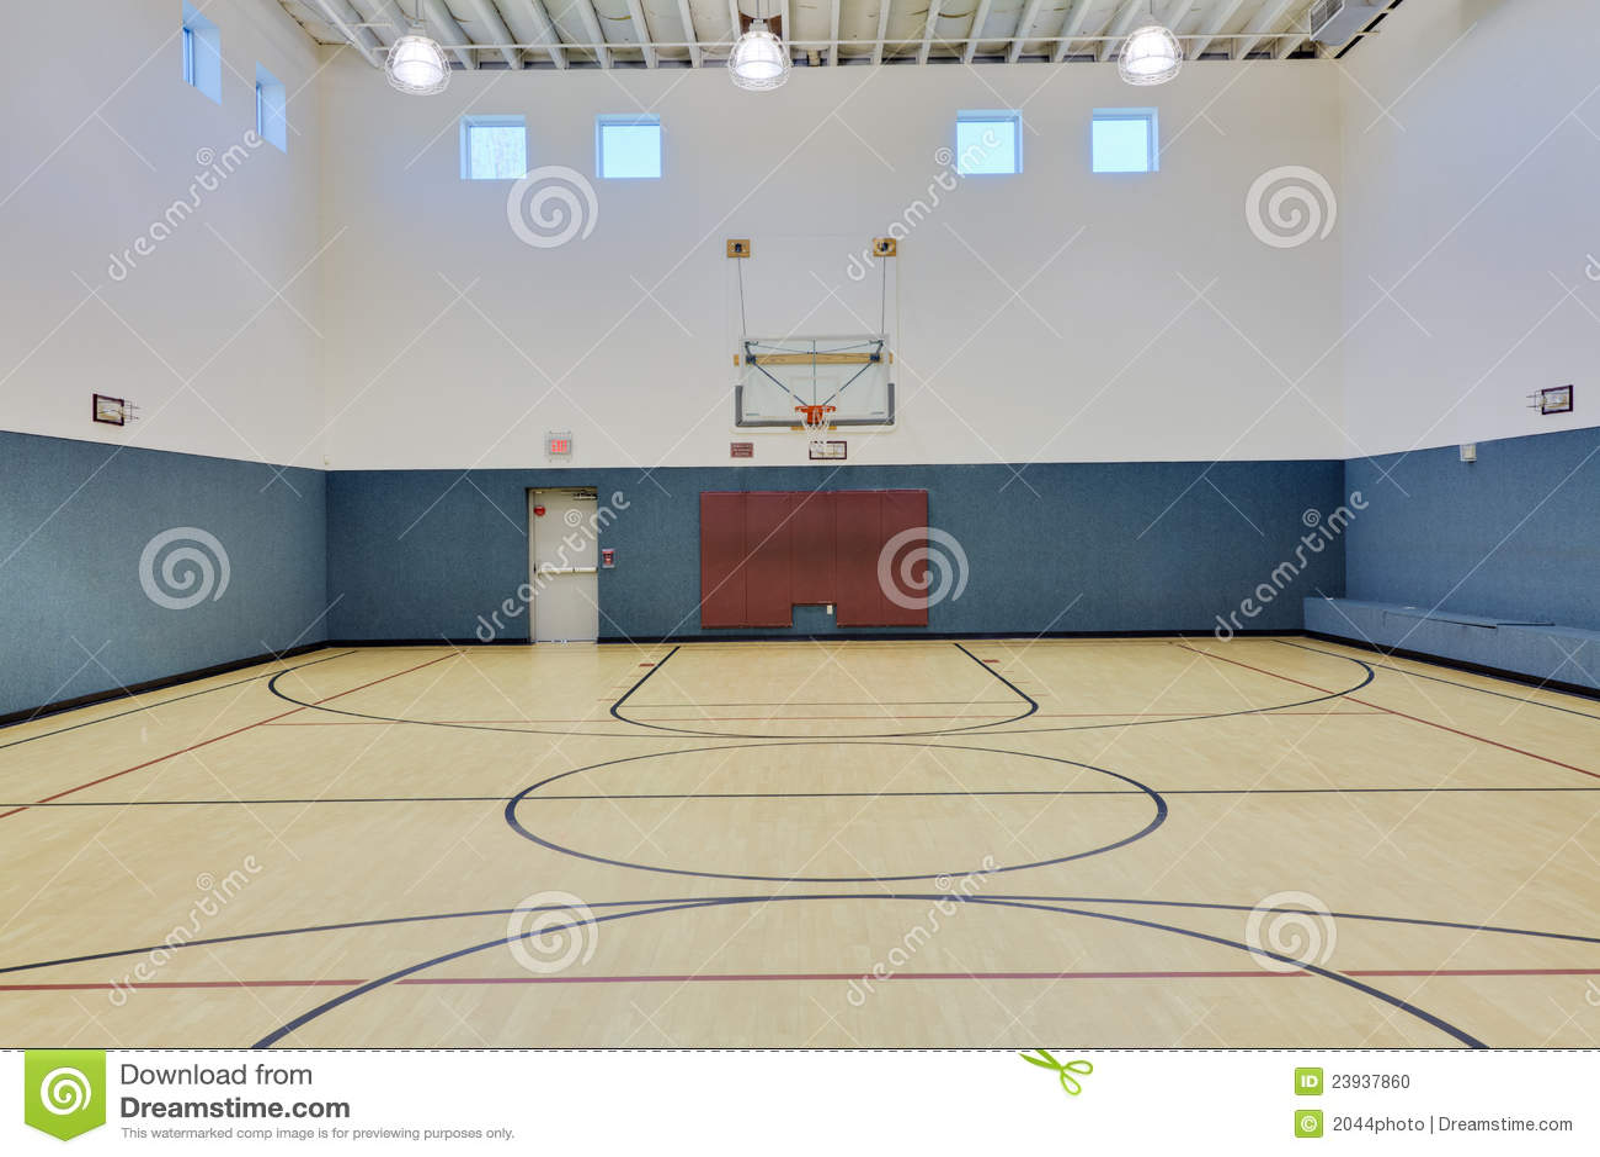 Indoor Basketball Court Stock Photo - Image: 23937860